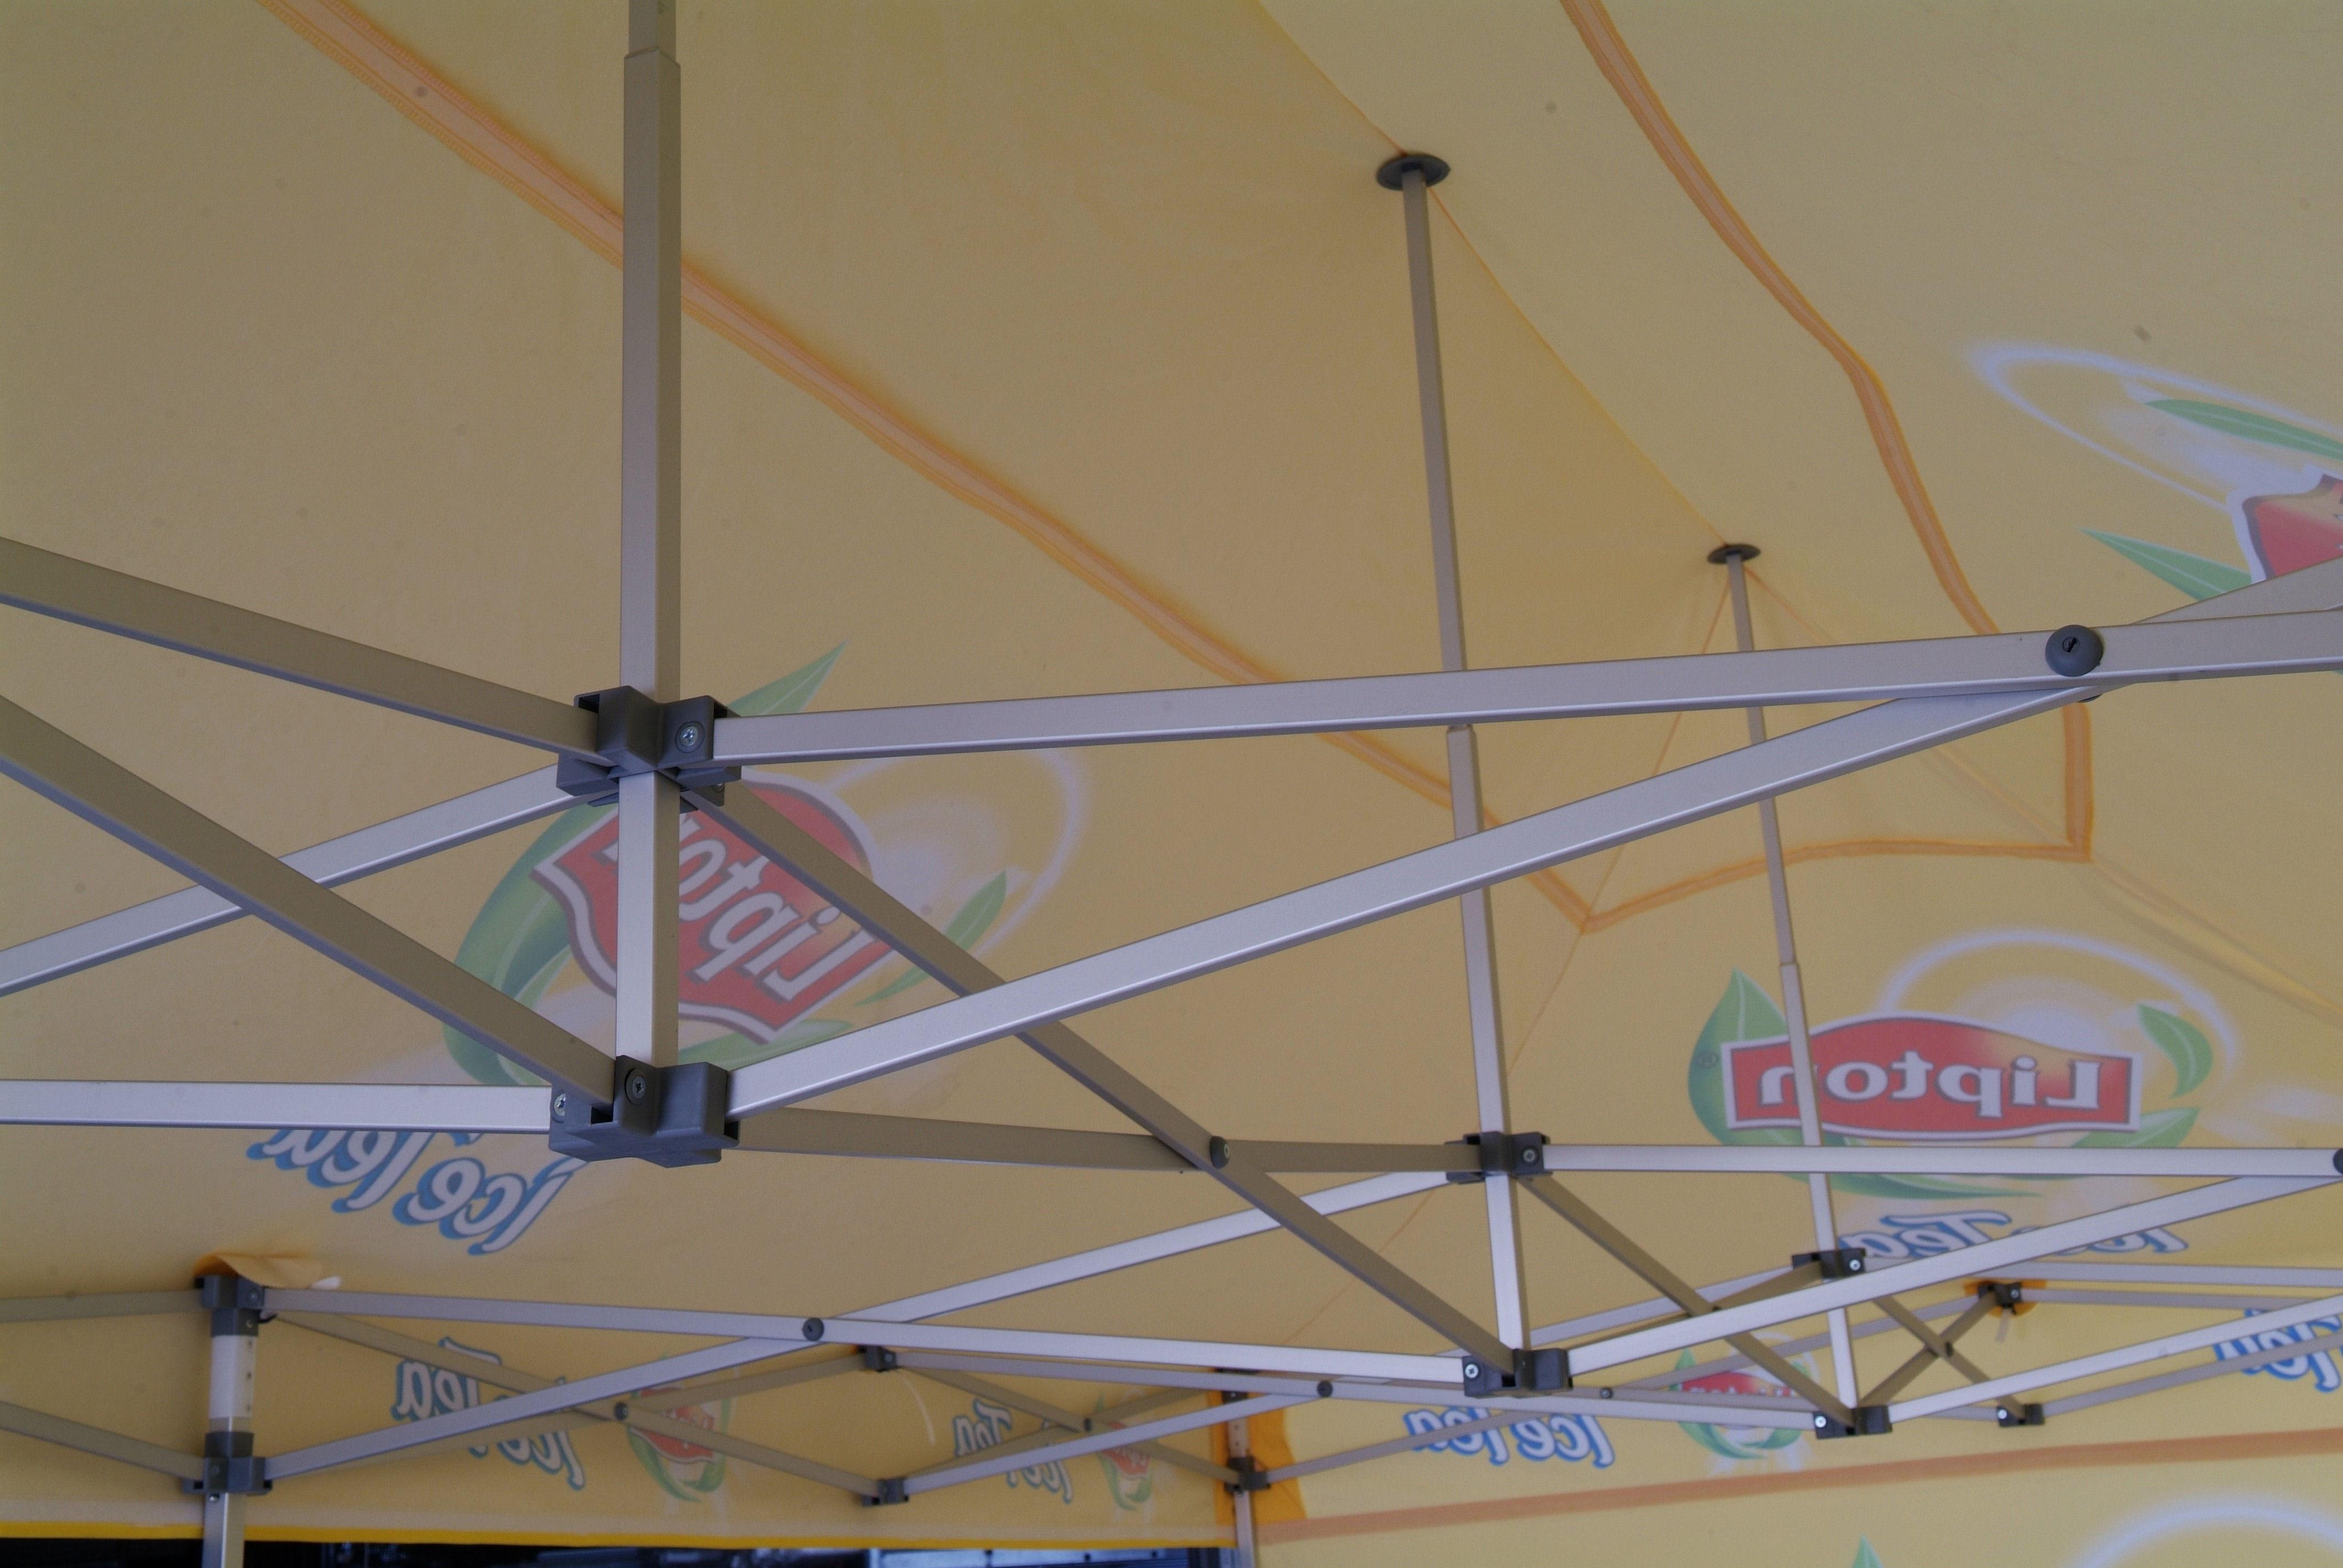 Umbrellas & Parasols inside branded gazebo